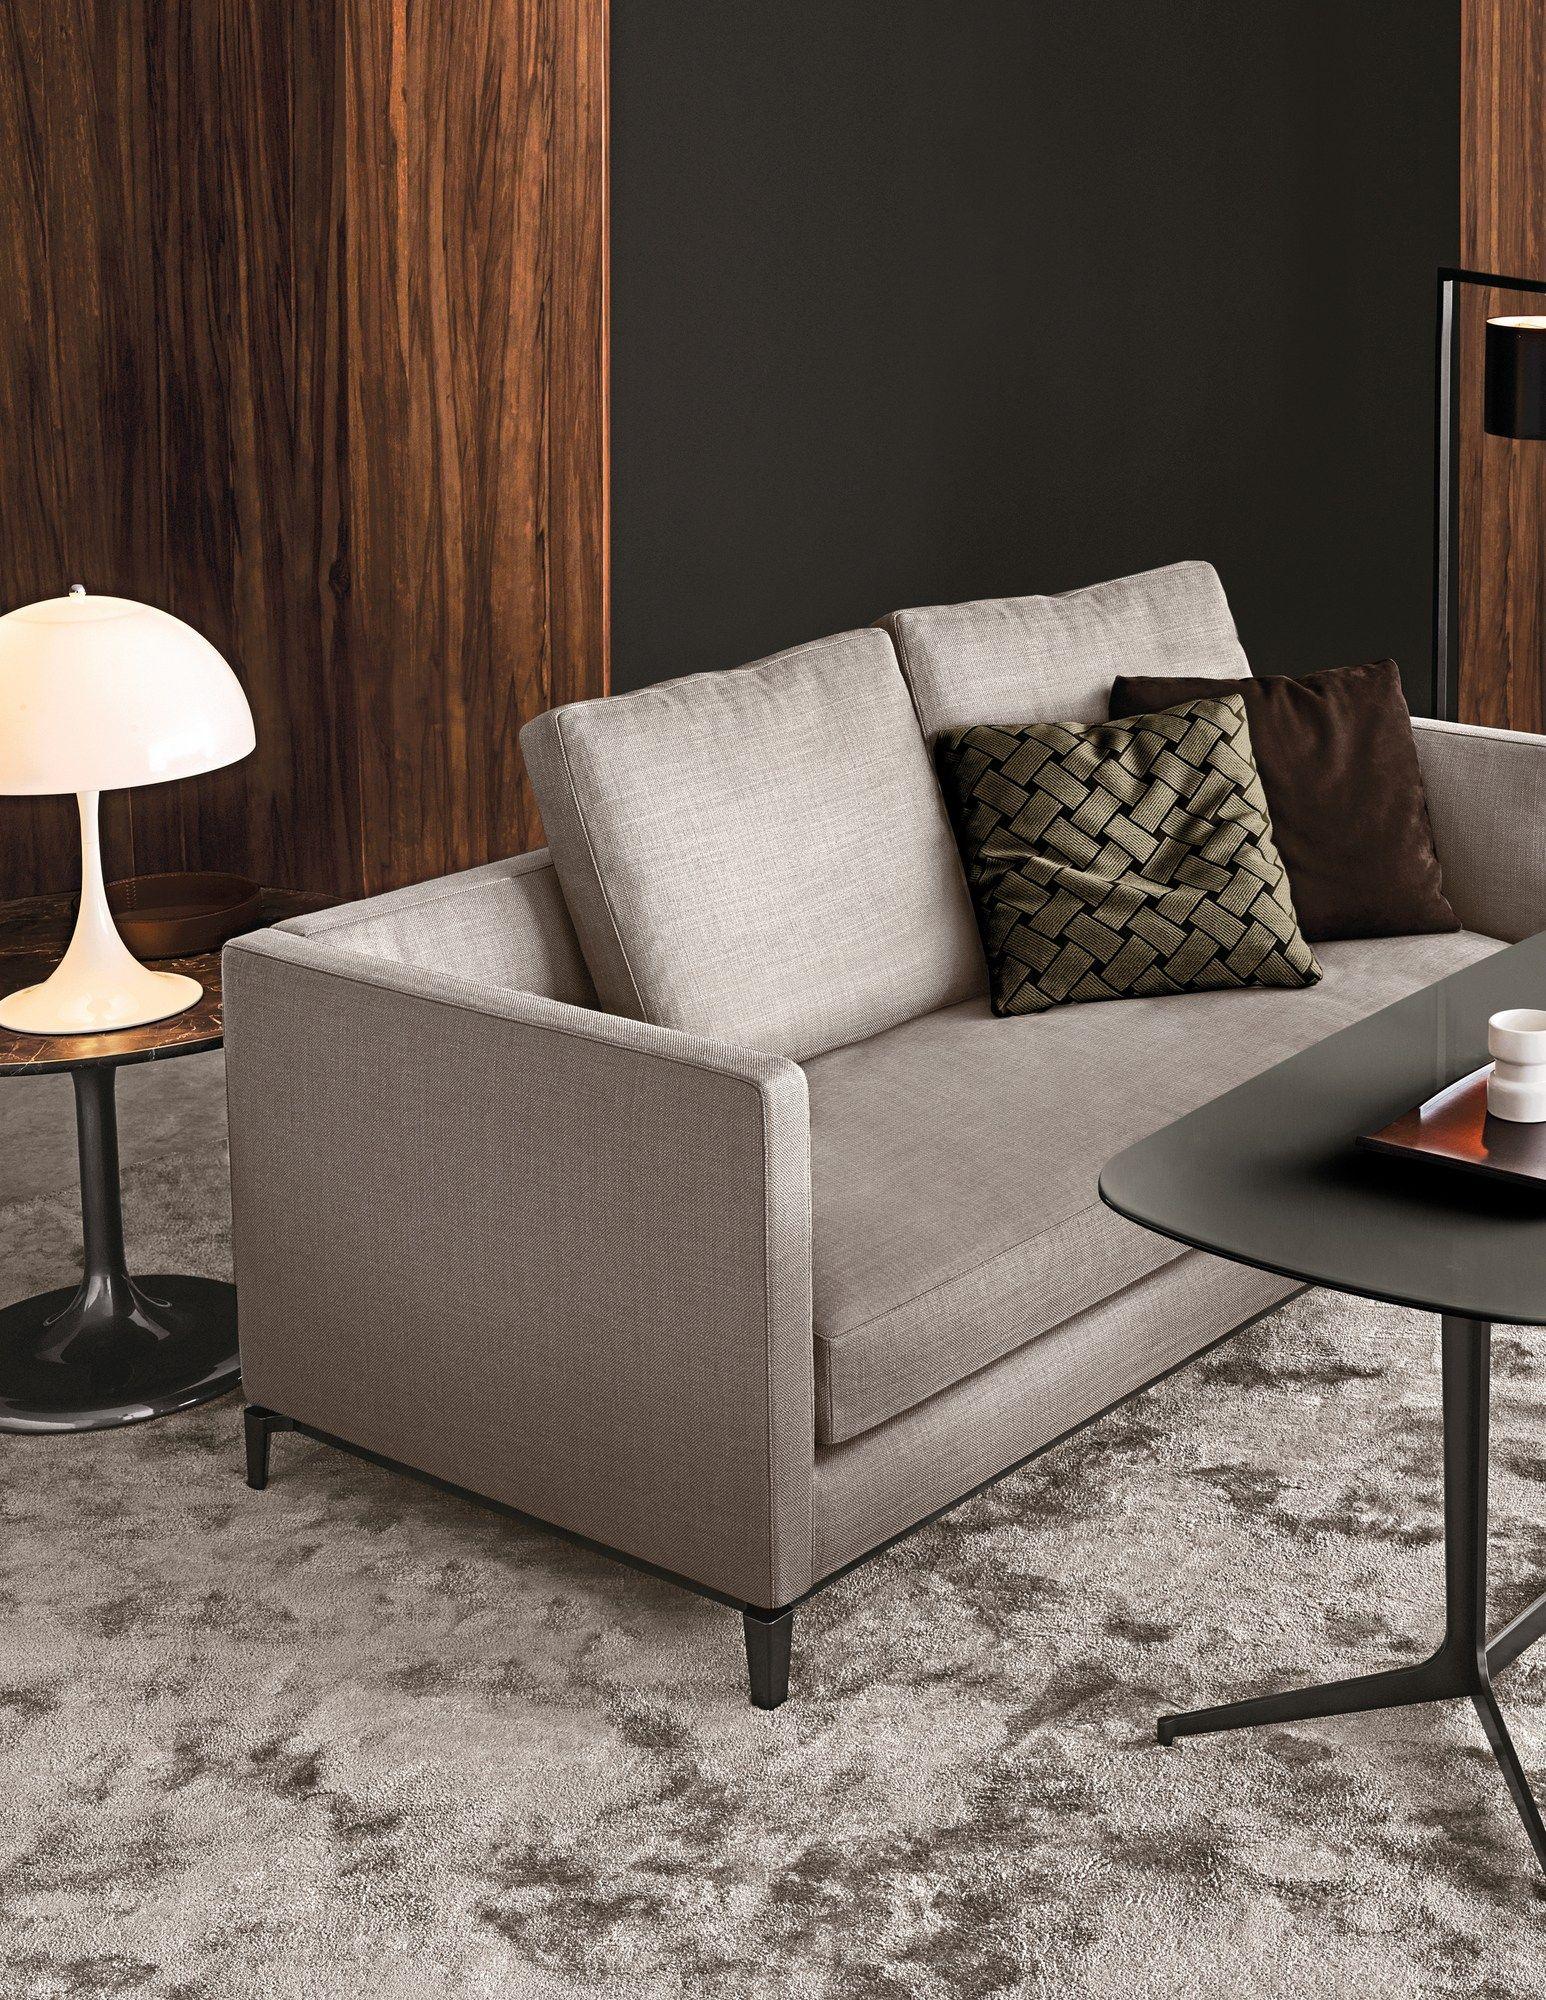 Andersen slim 90 andersen slim 90 quilt by minotti design for Sofa 90 cm sitztiefe